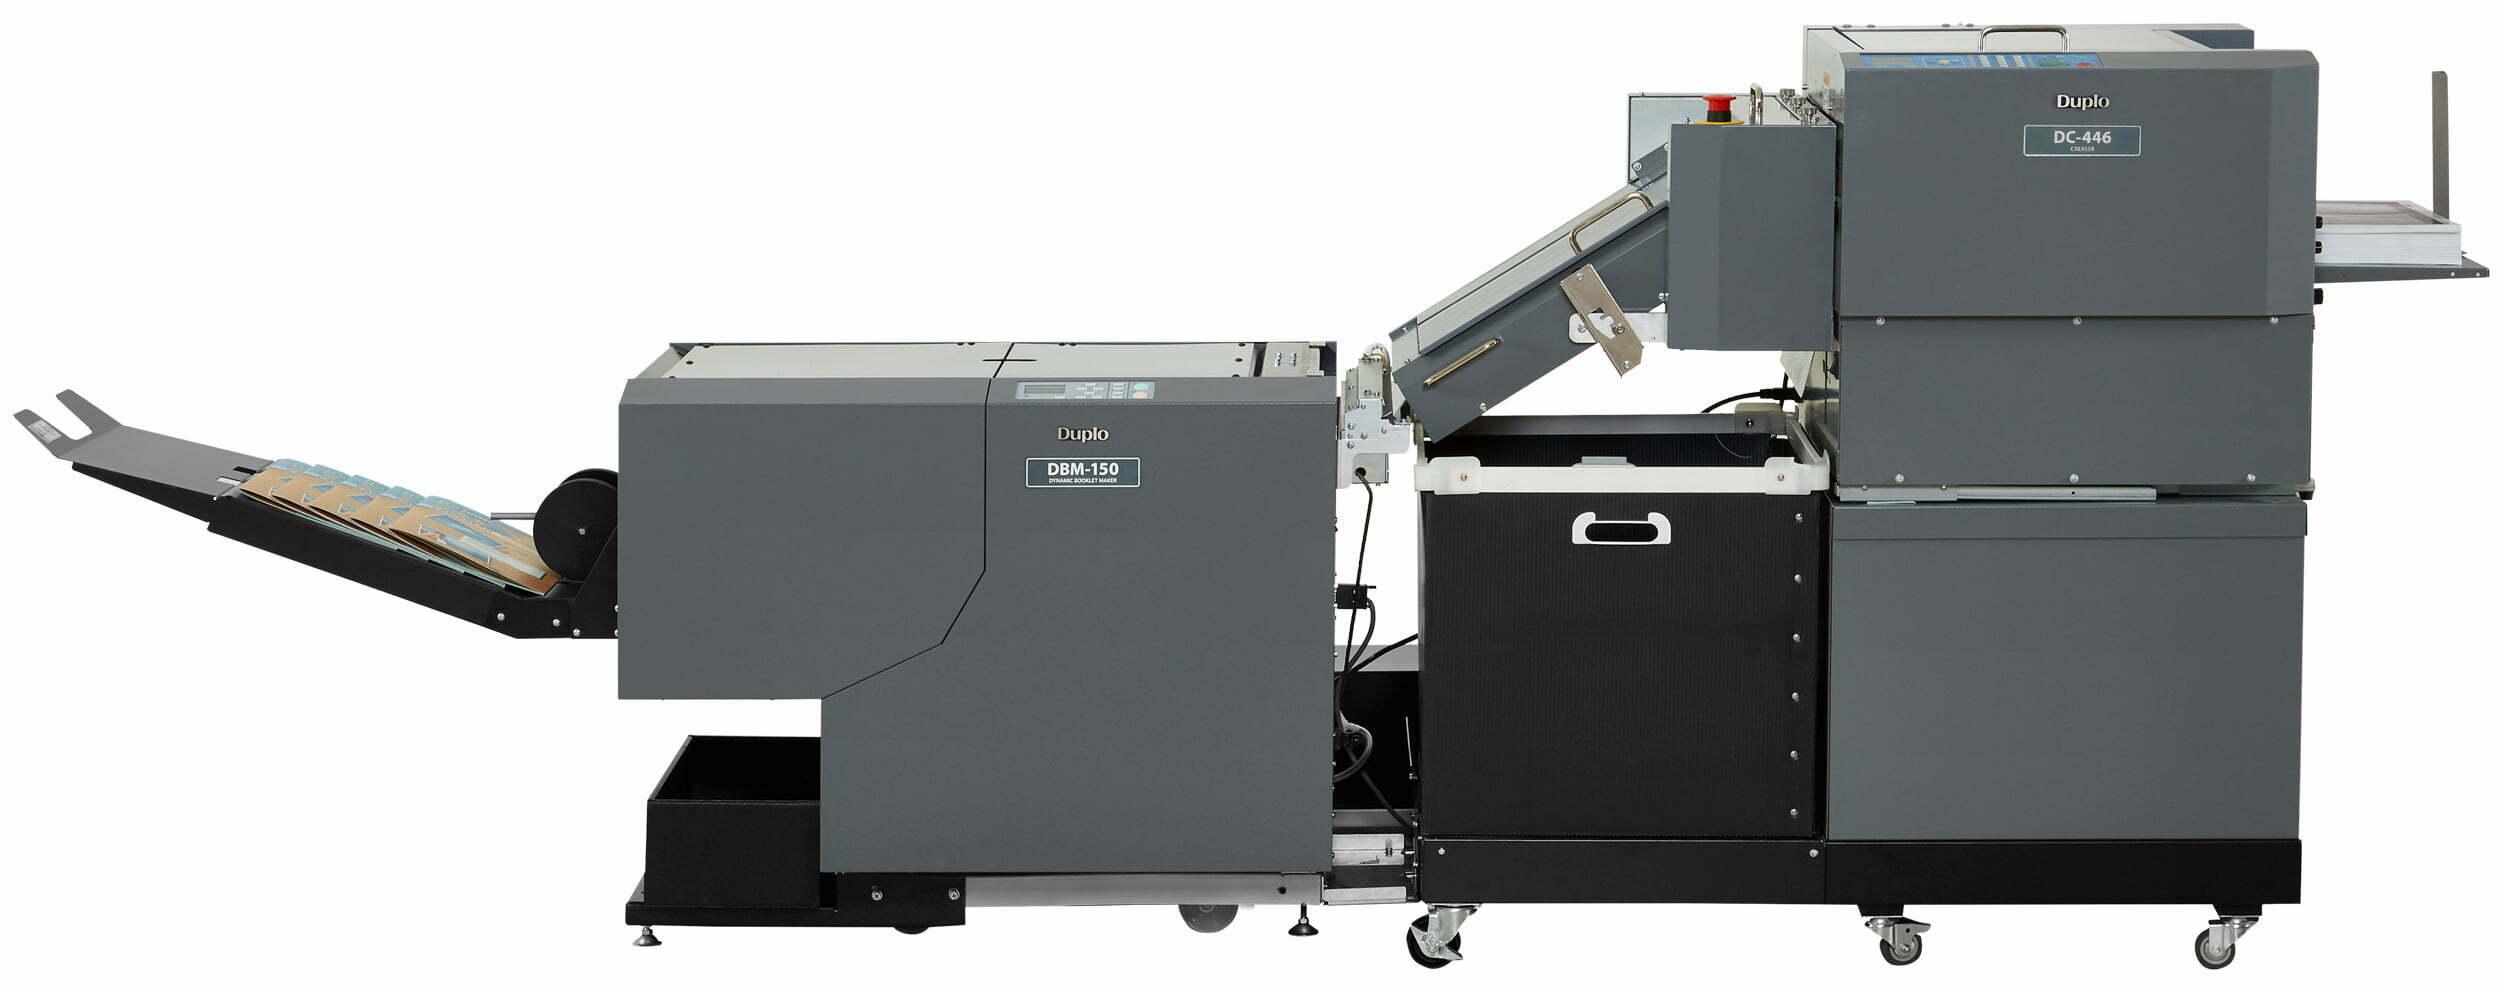 Duplo-150Cr-DC-446-&-DBM-150 bookletmaker met ril